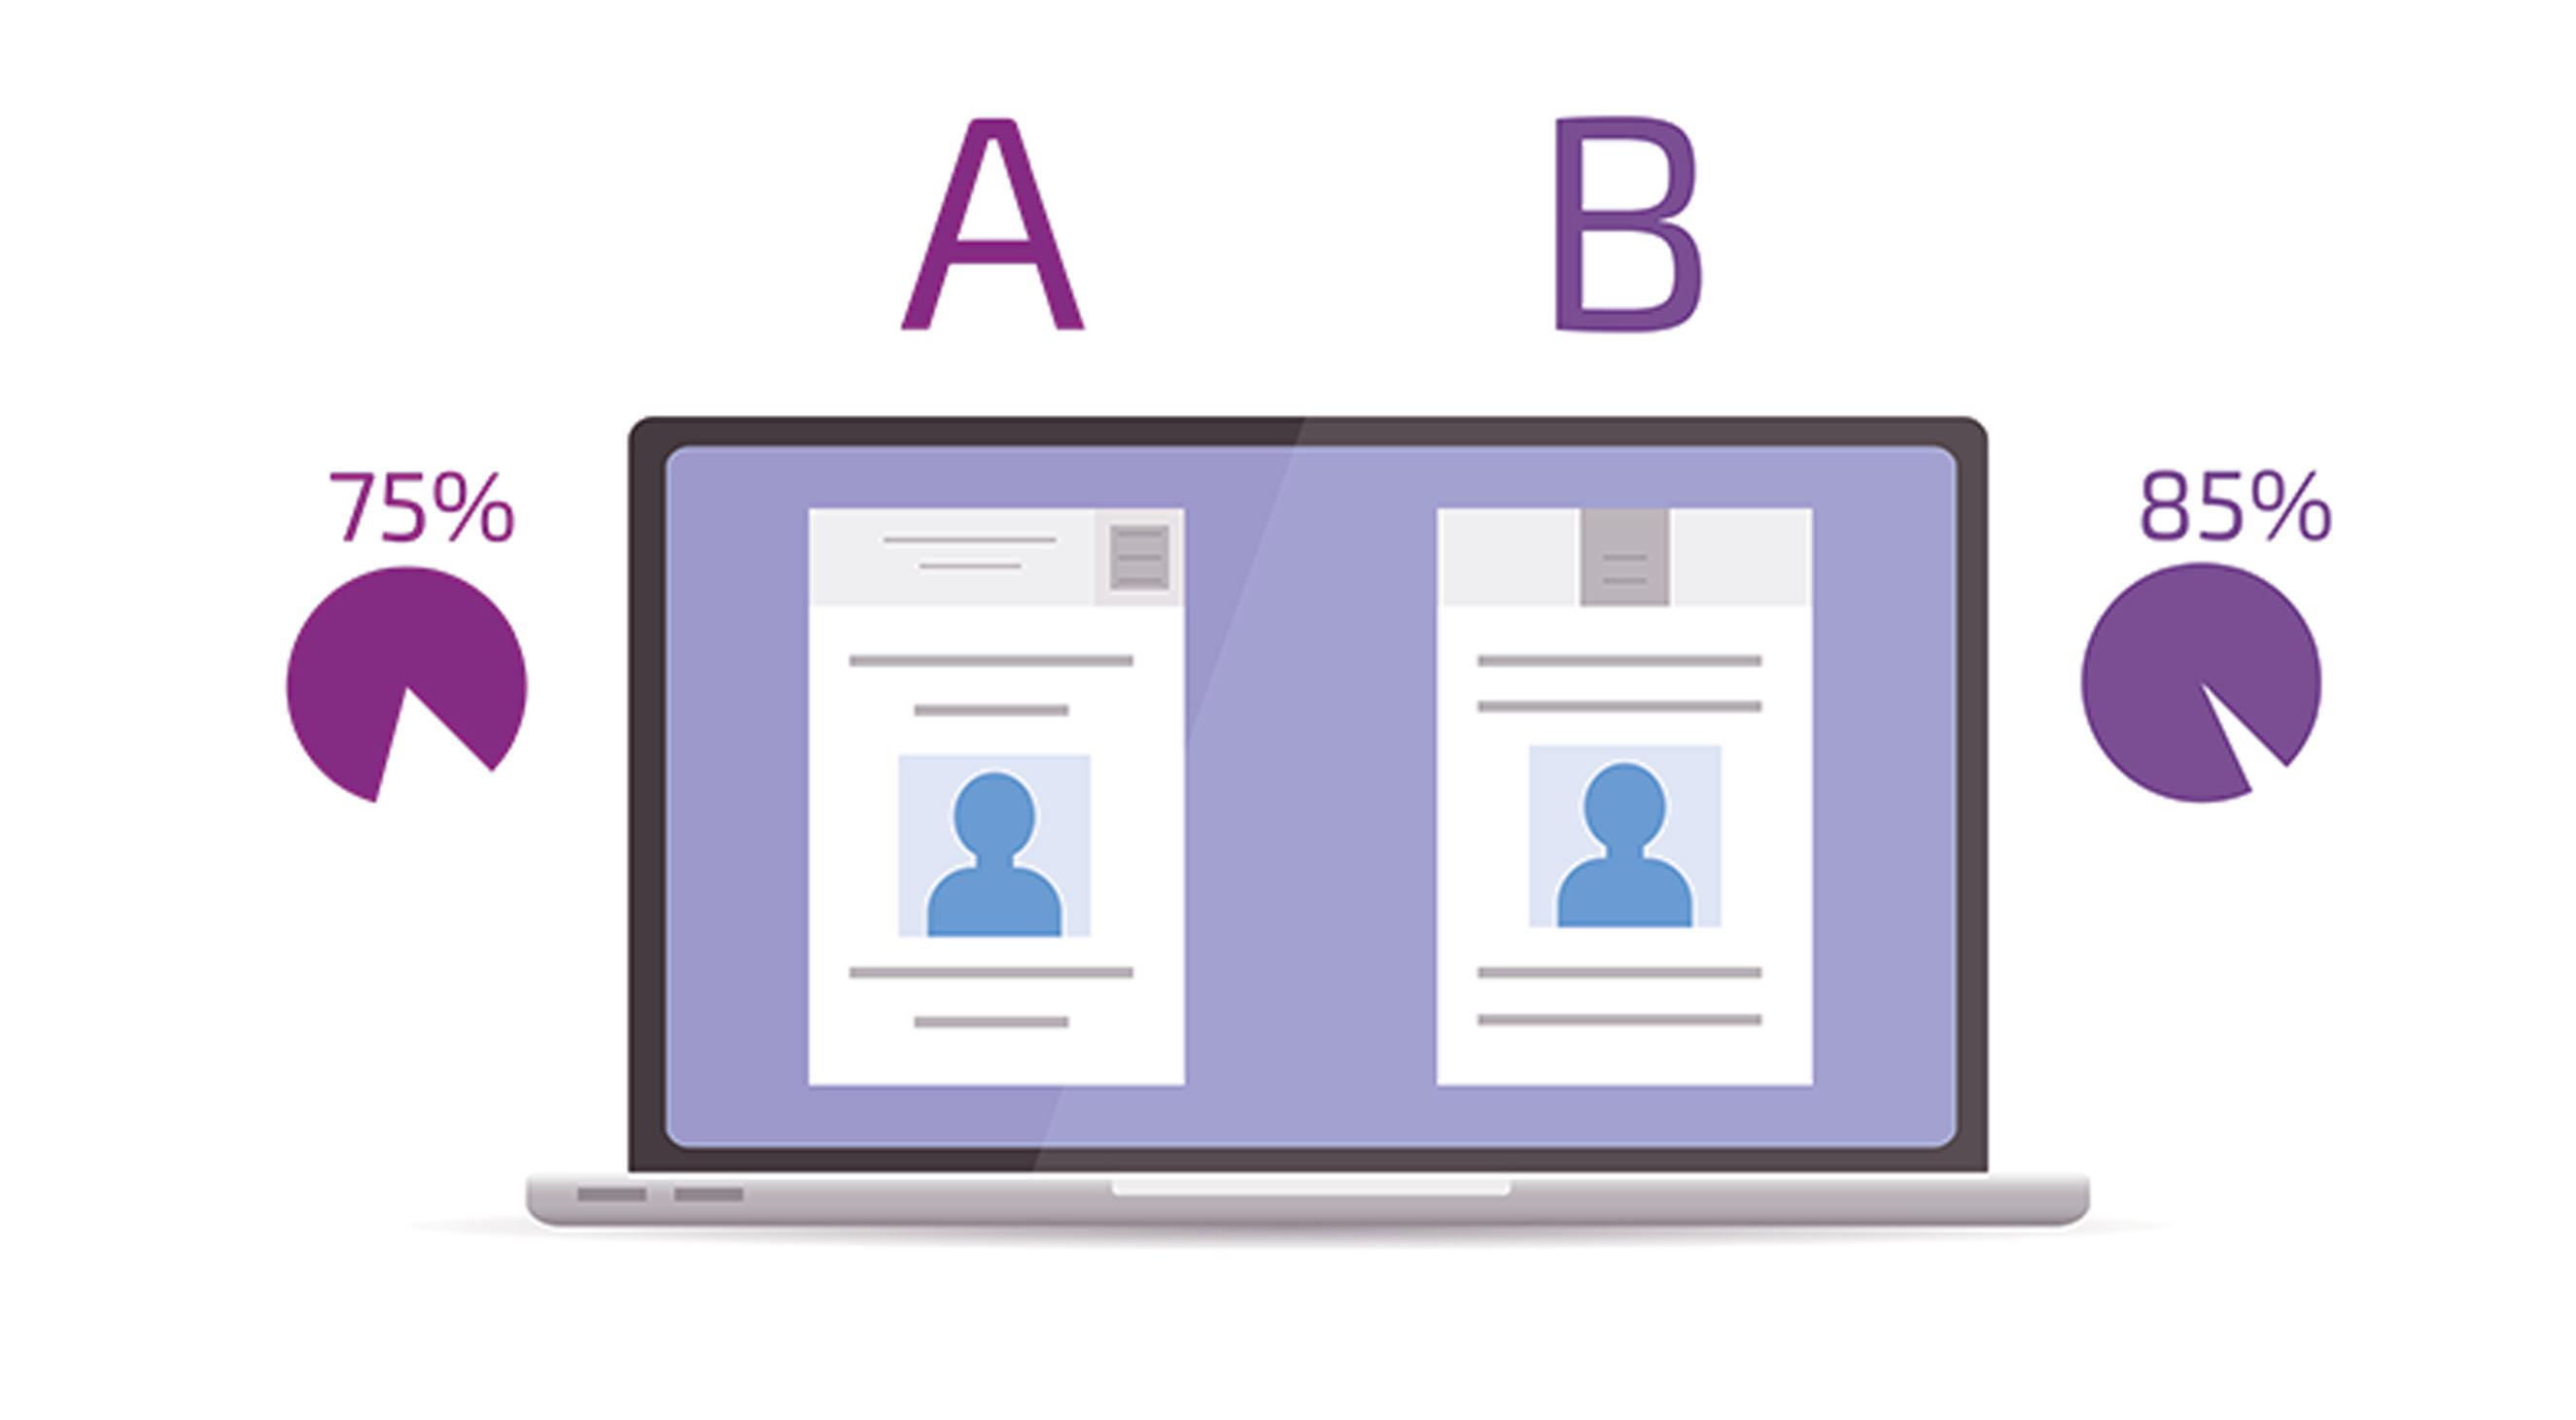 A/B Testing Iconography